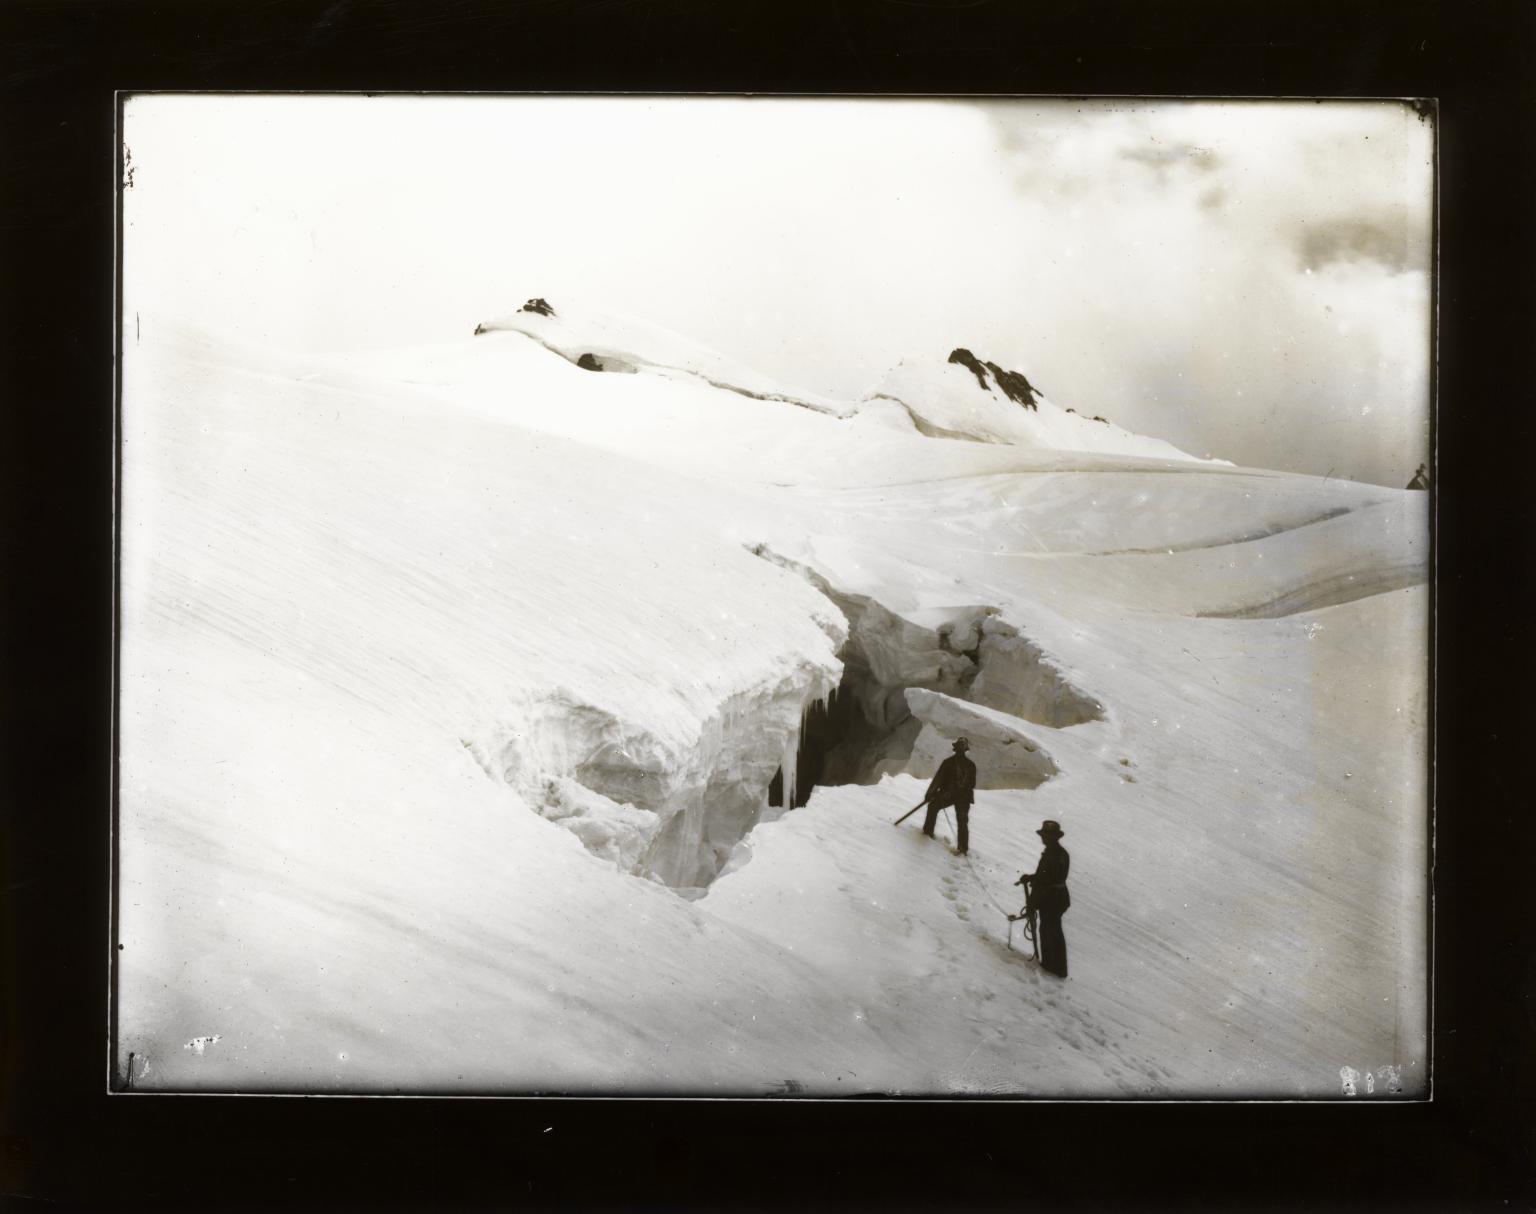 Zadezen Glacier, Italy and Switzerland